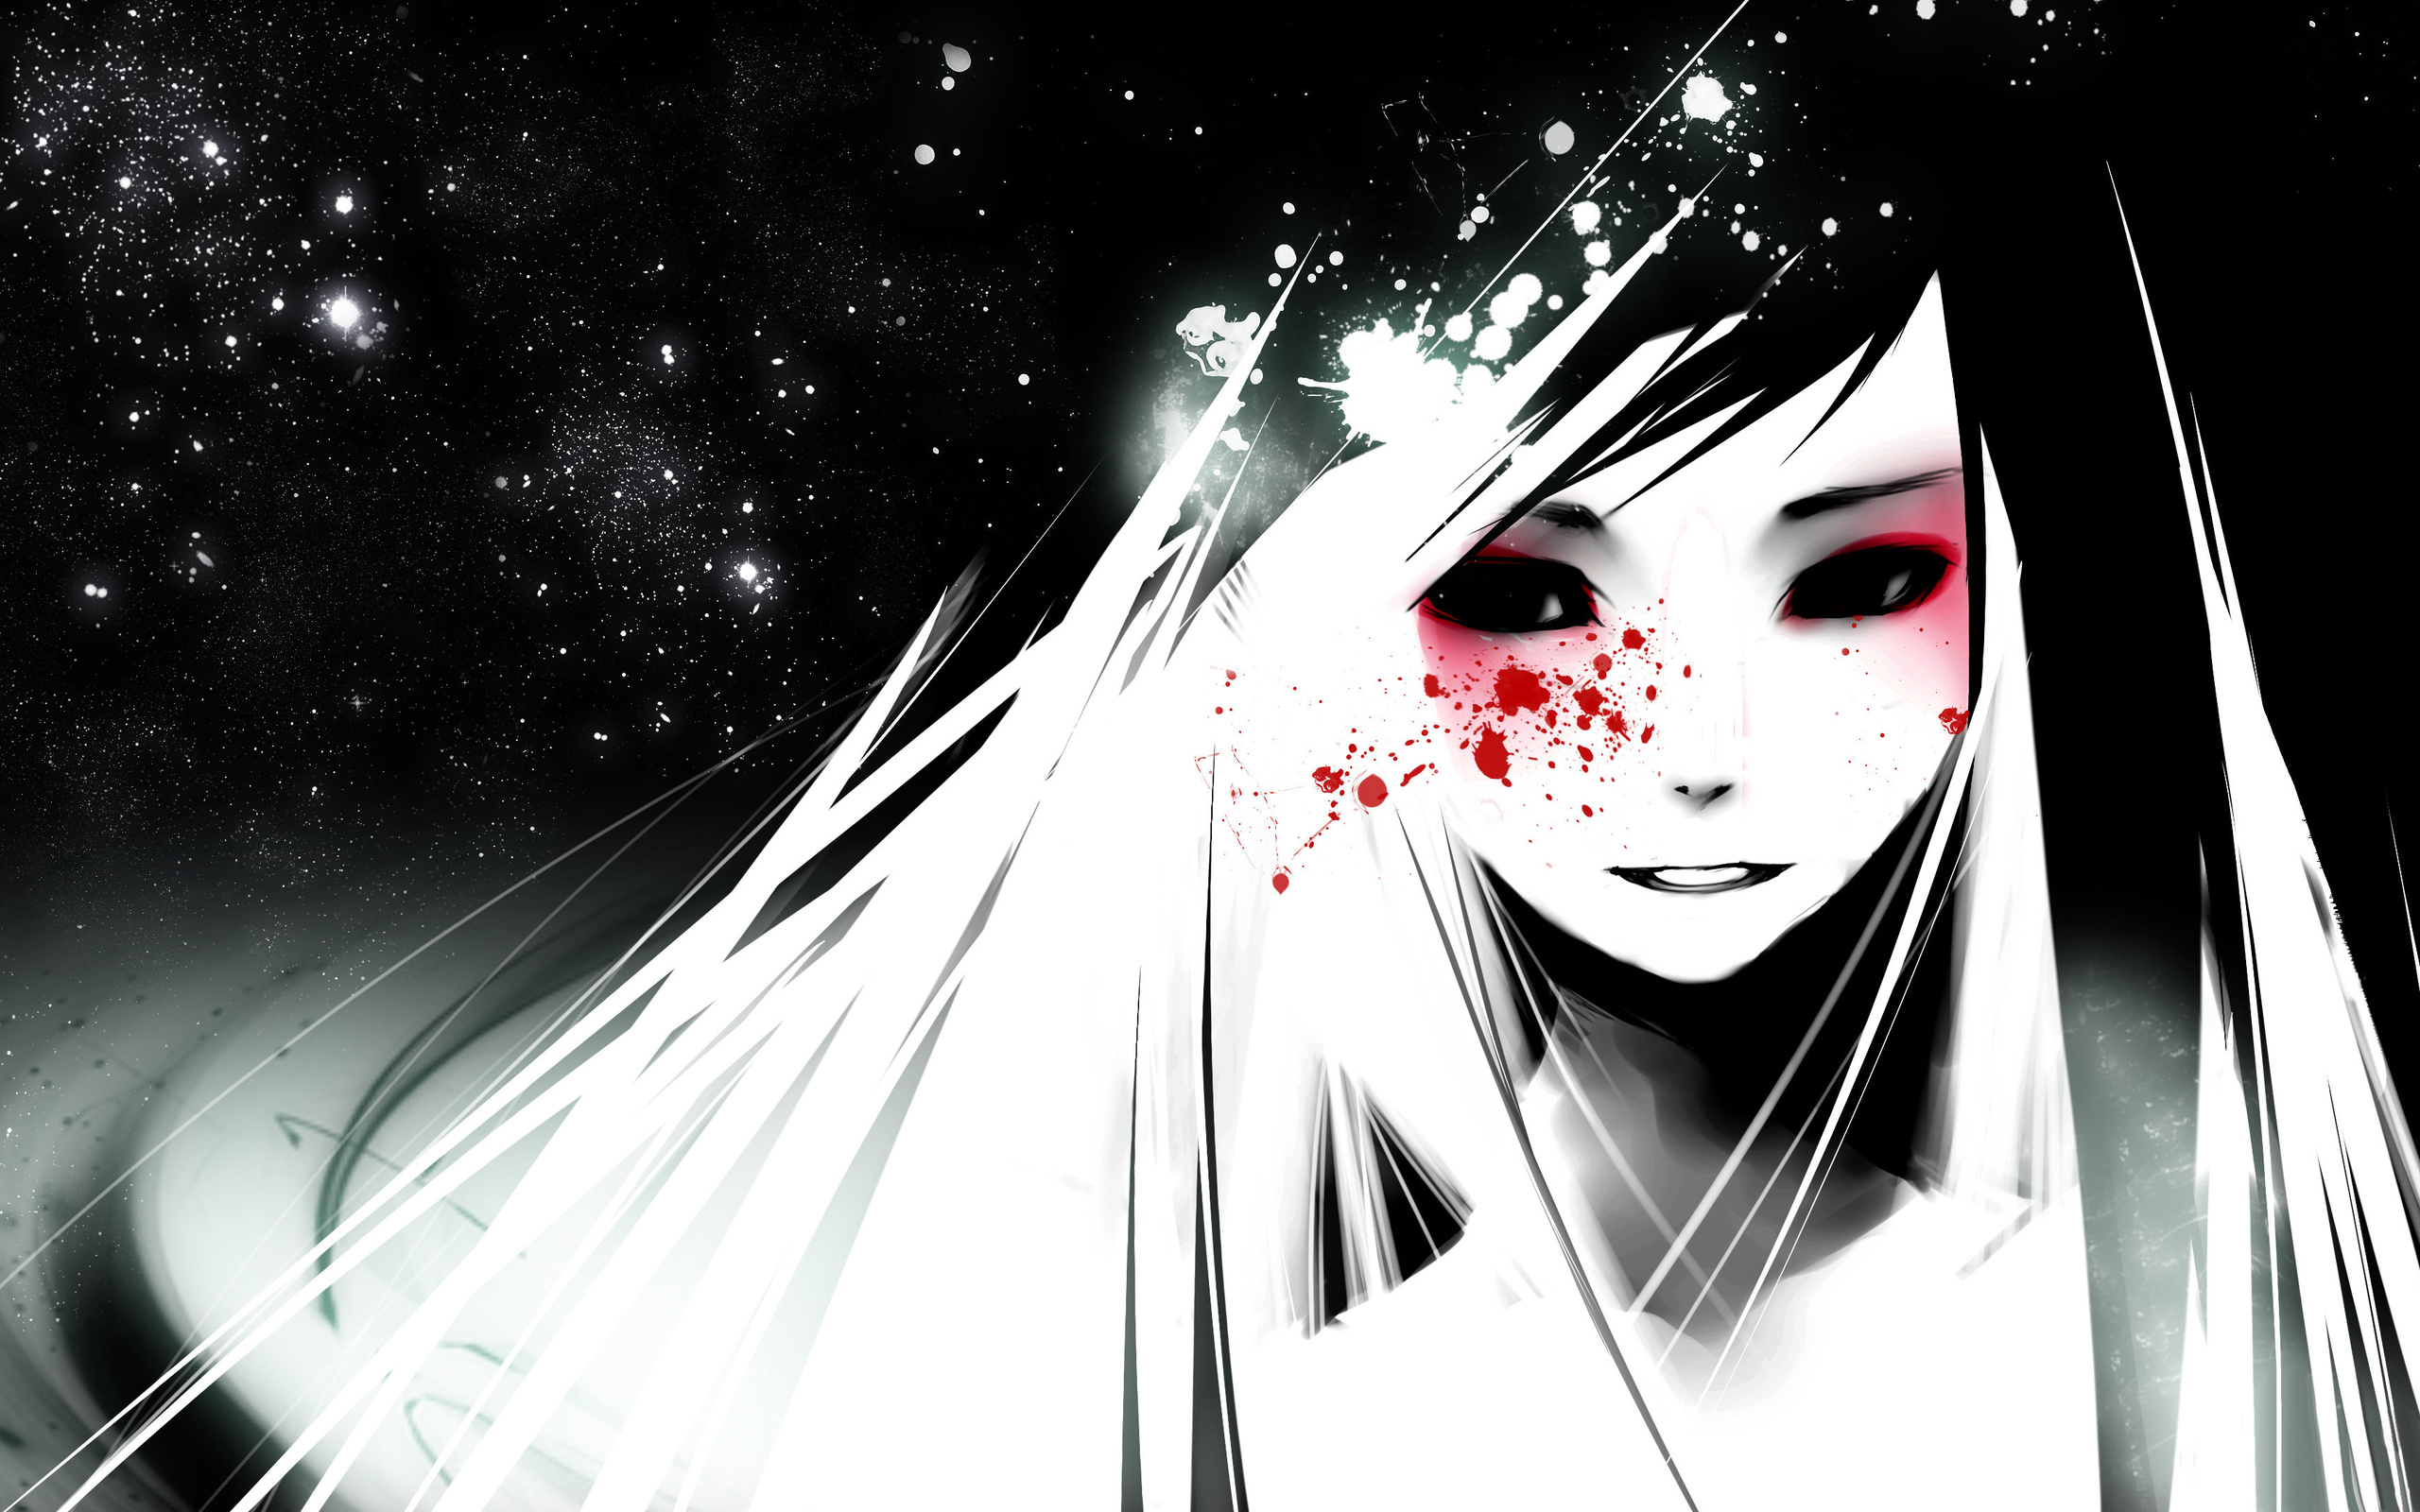 anime wallpaper 1 - photo #4